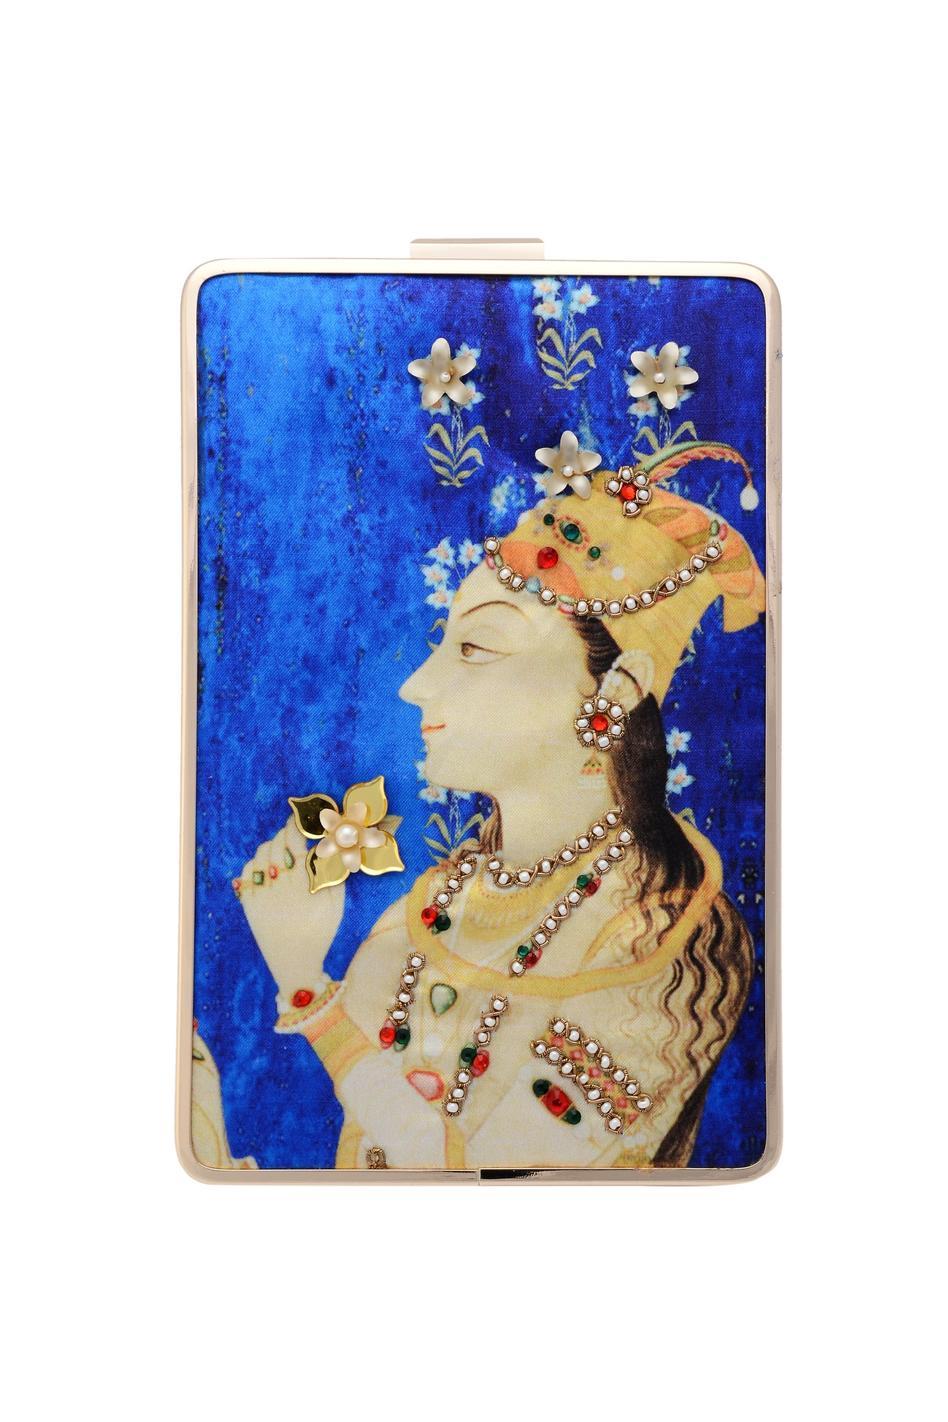 Blue rectangular clutch with a digital print